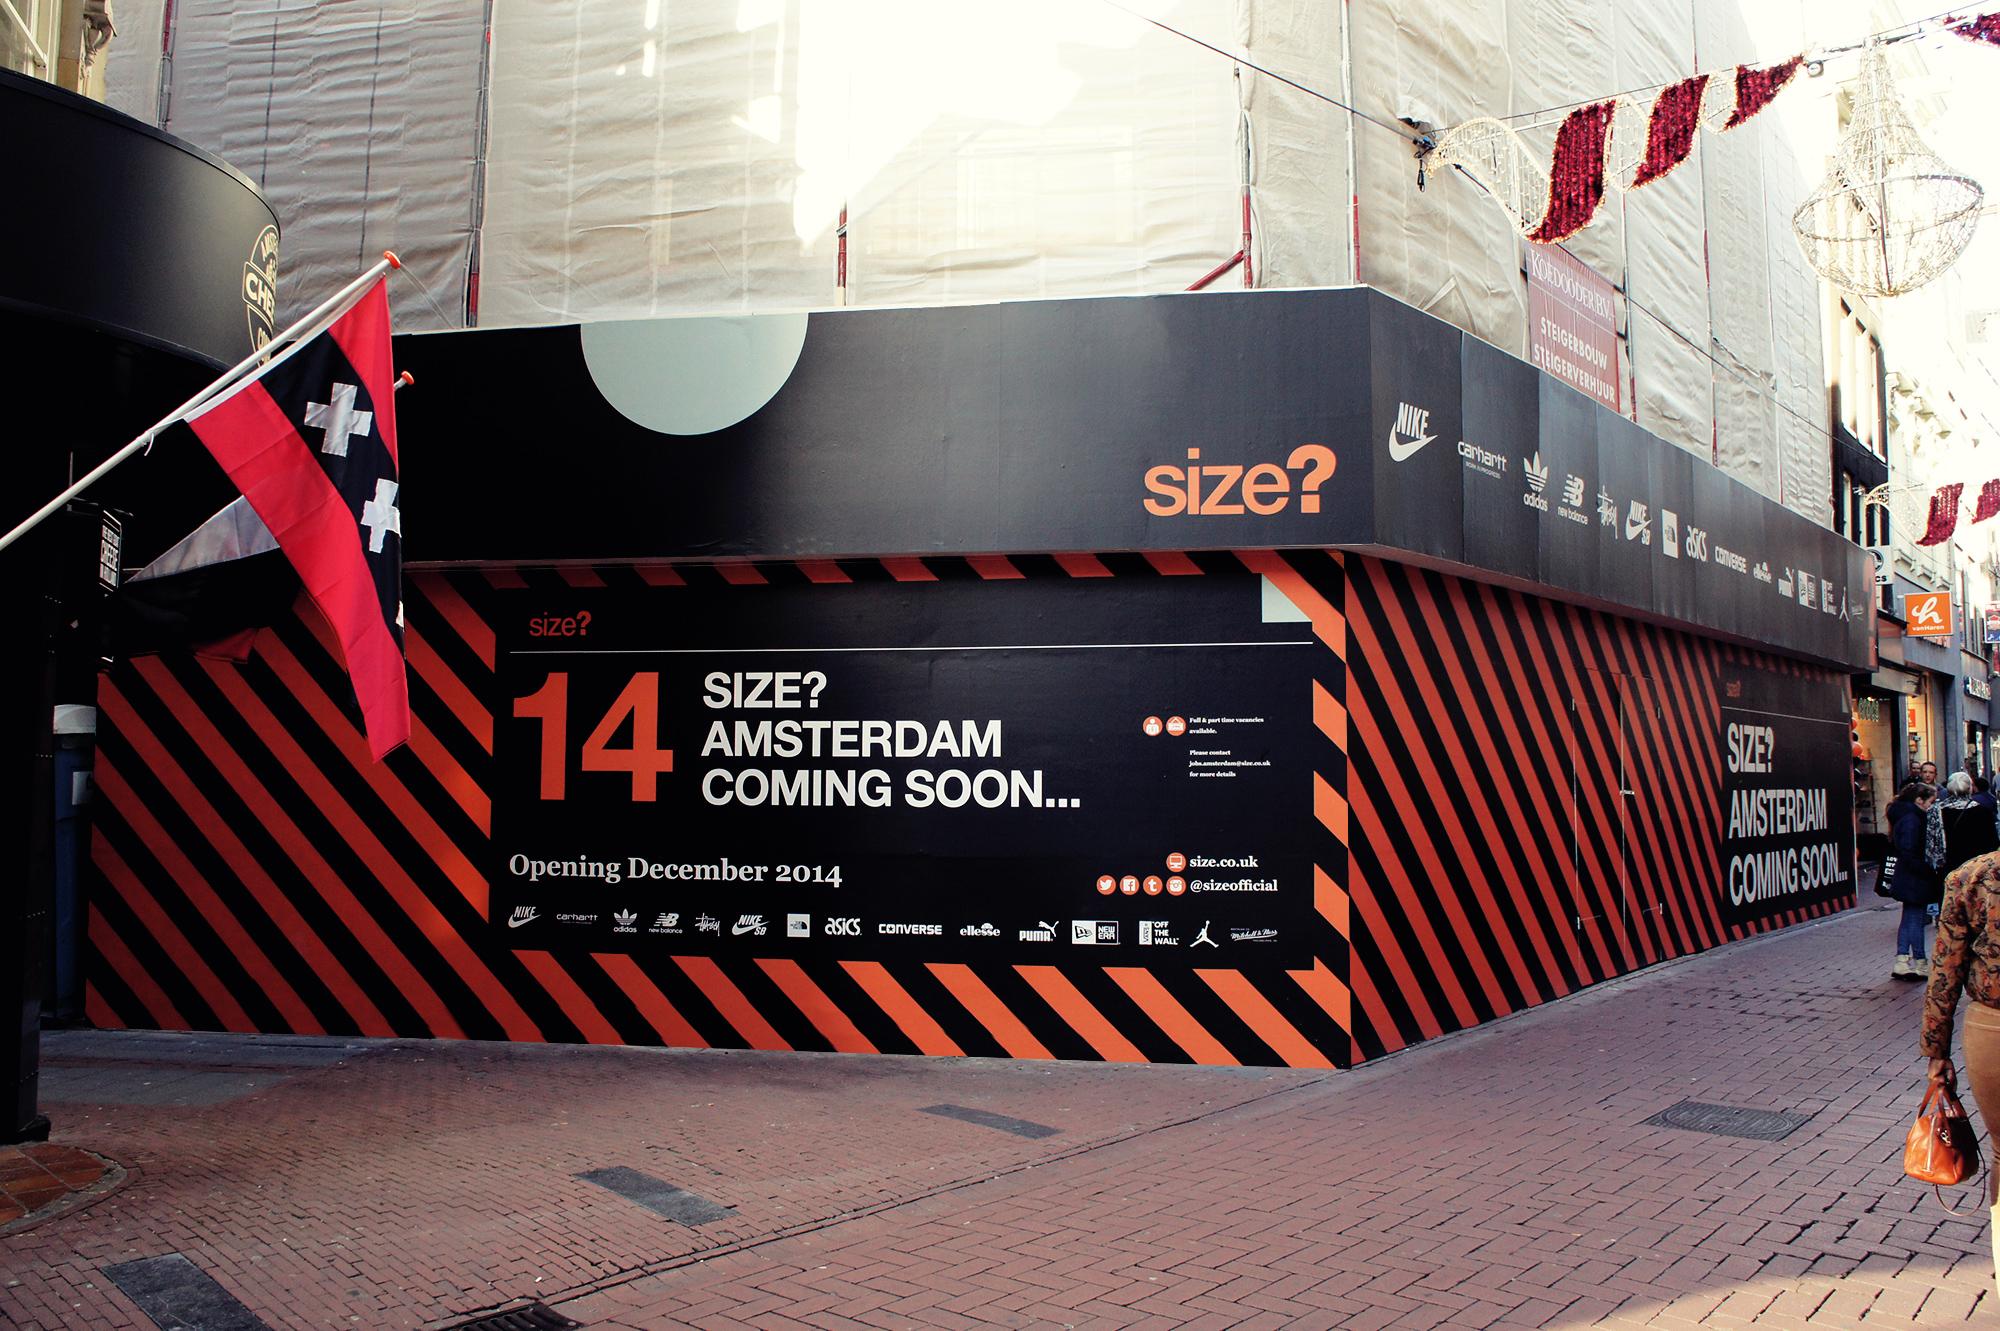 size? Amsterdam: Opening December 2014.